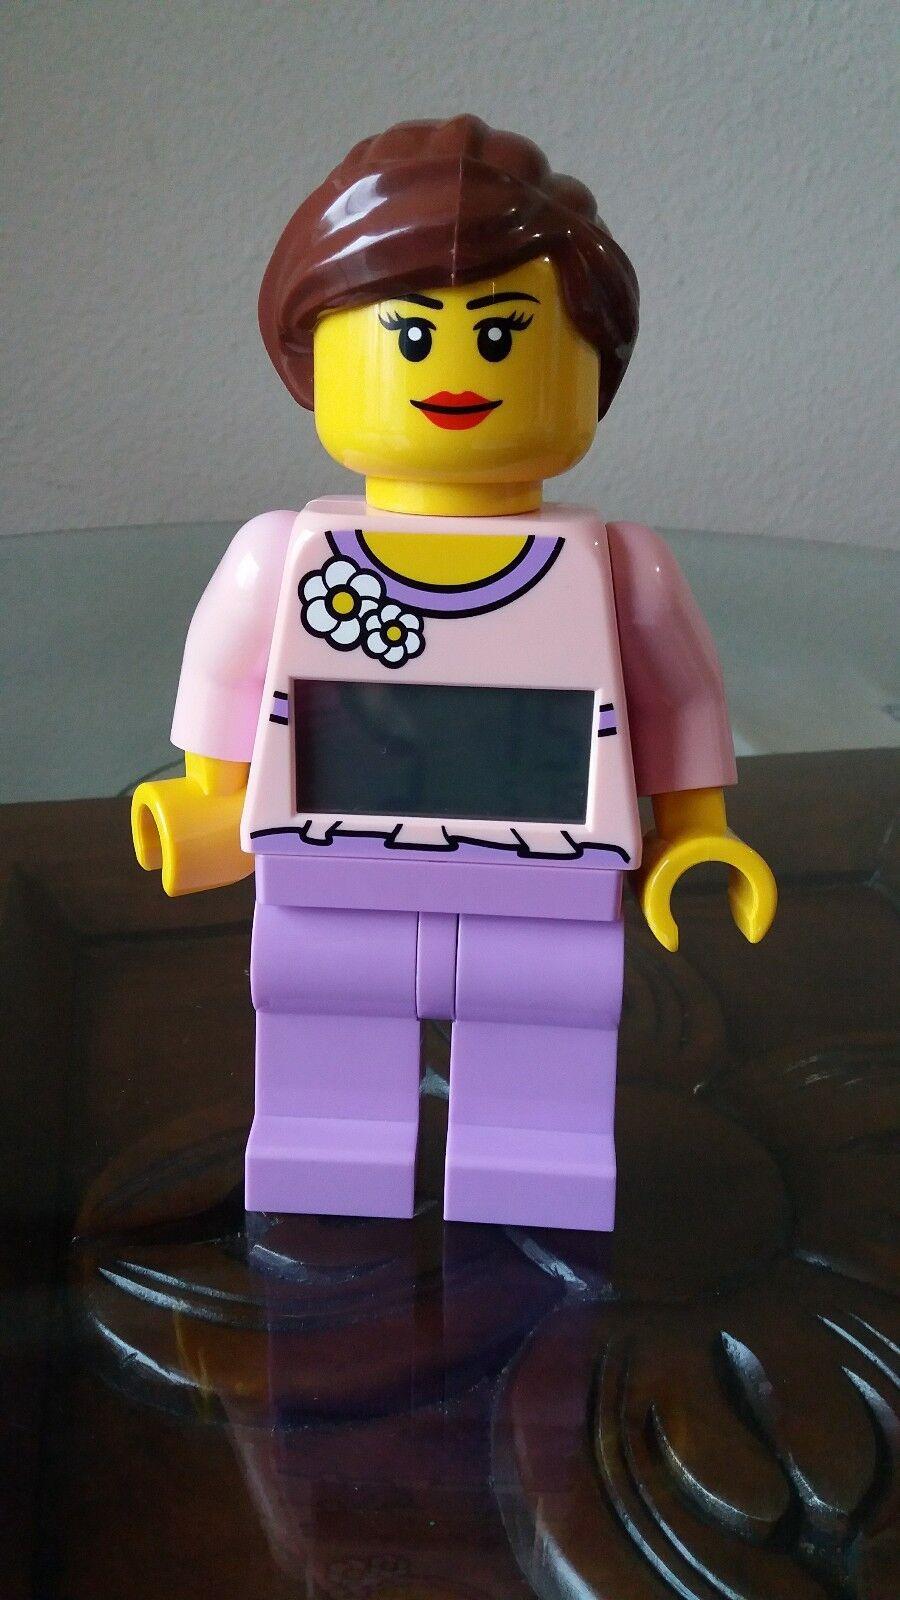 Lego Belville Girl Minifigure Alarm Clock with Licht